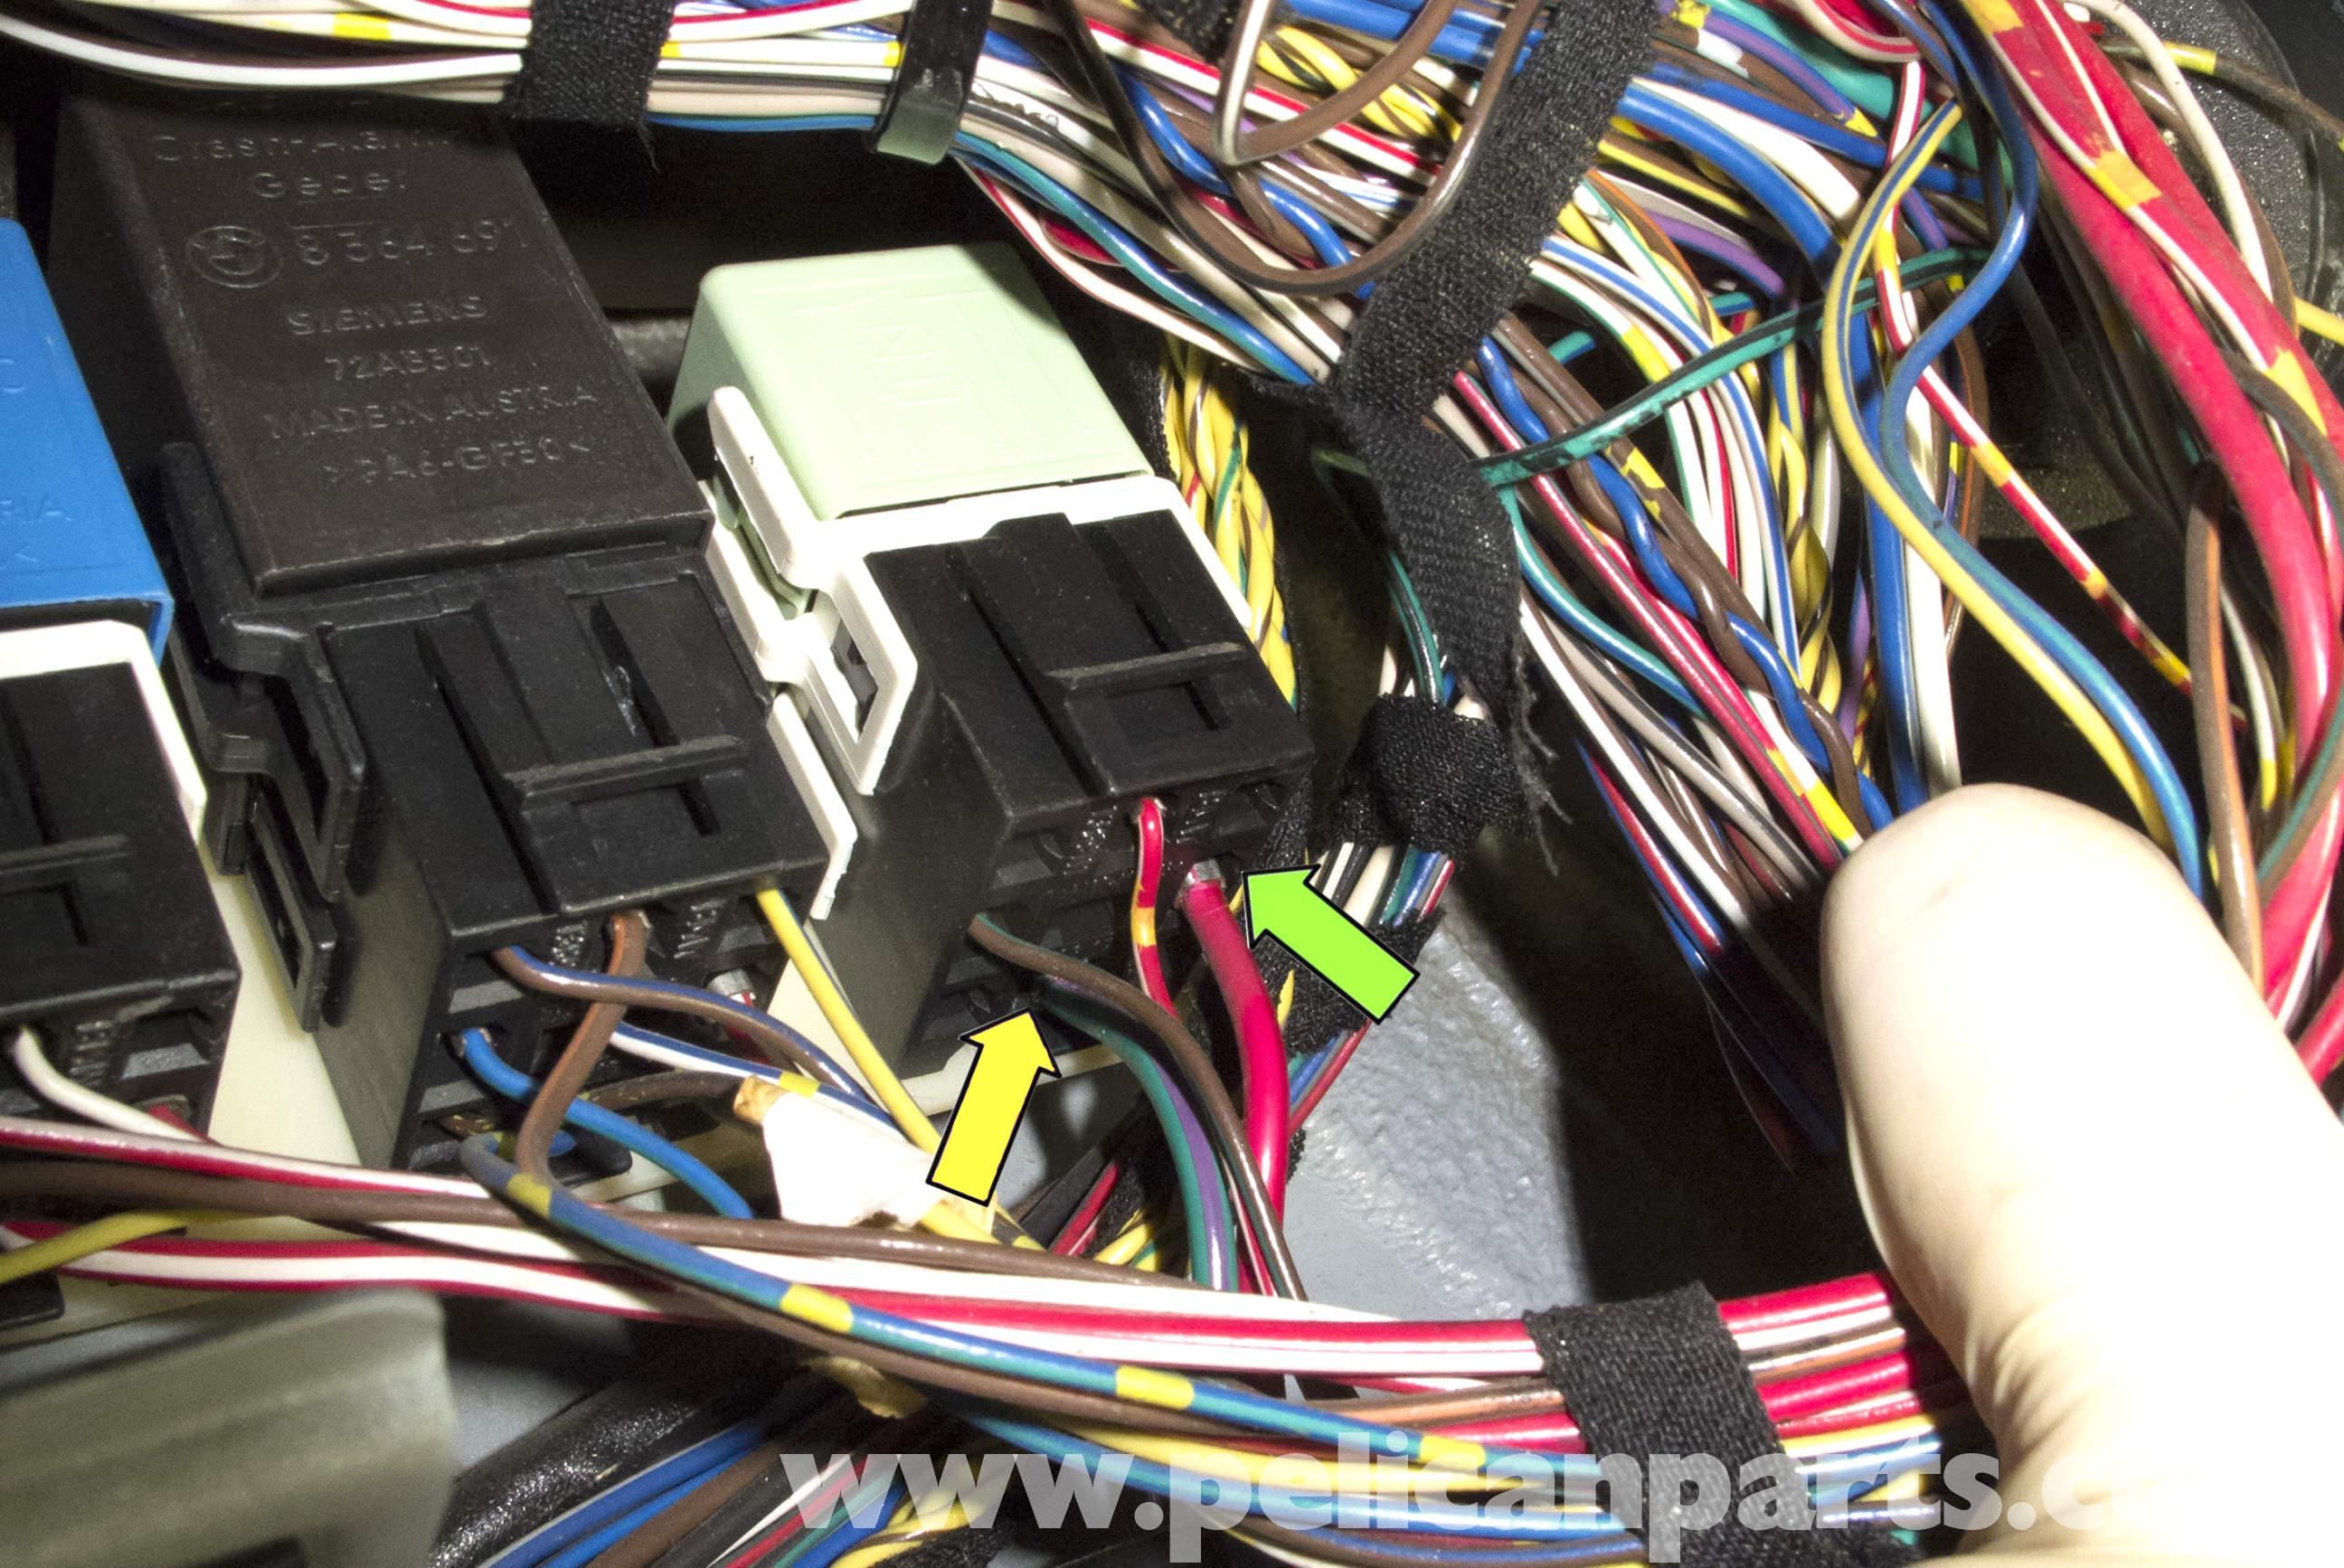 bmw z3 relay diagram bmw image wiring diagram bmw z3 fuel pump testing 1996 2002 pelican parts diy on bmw z3 relay diagram